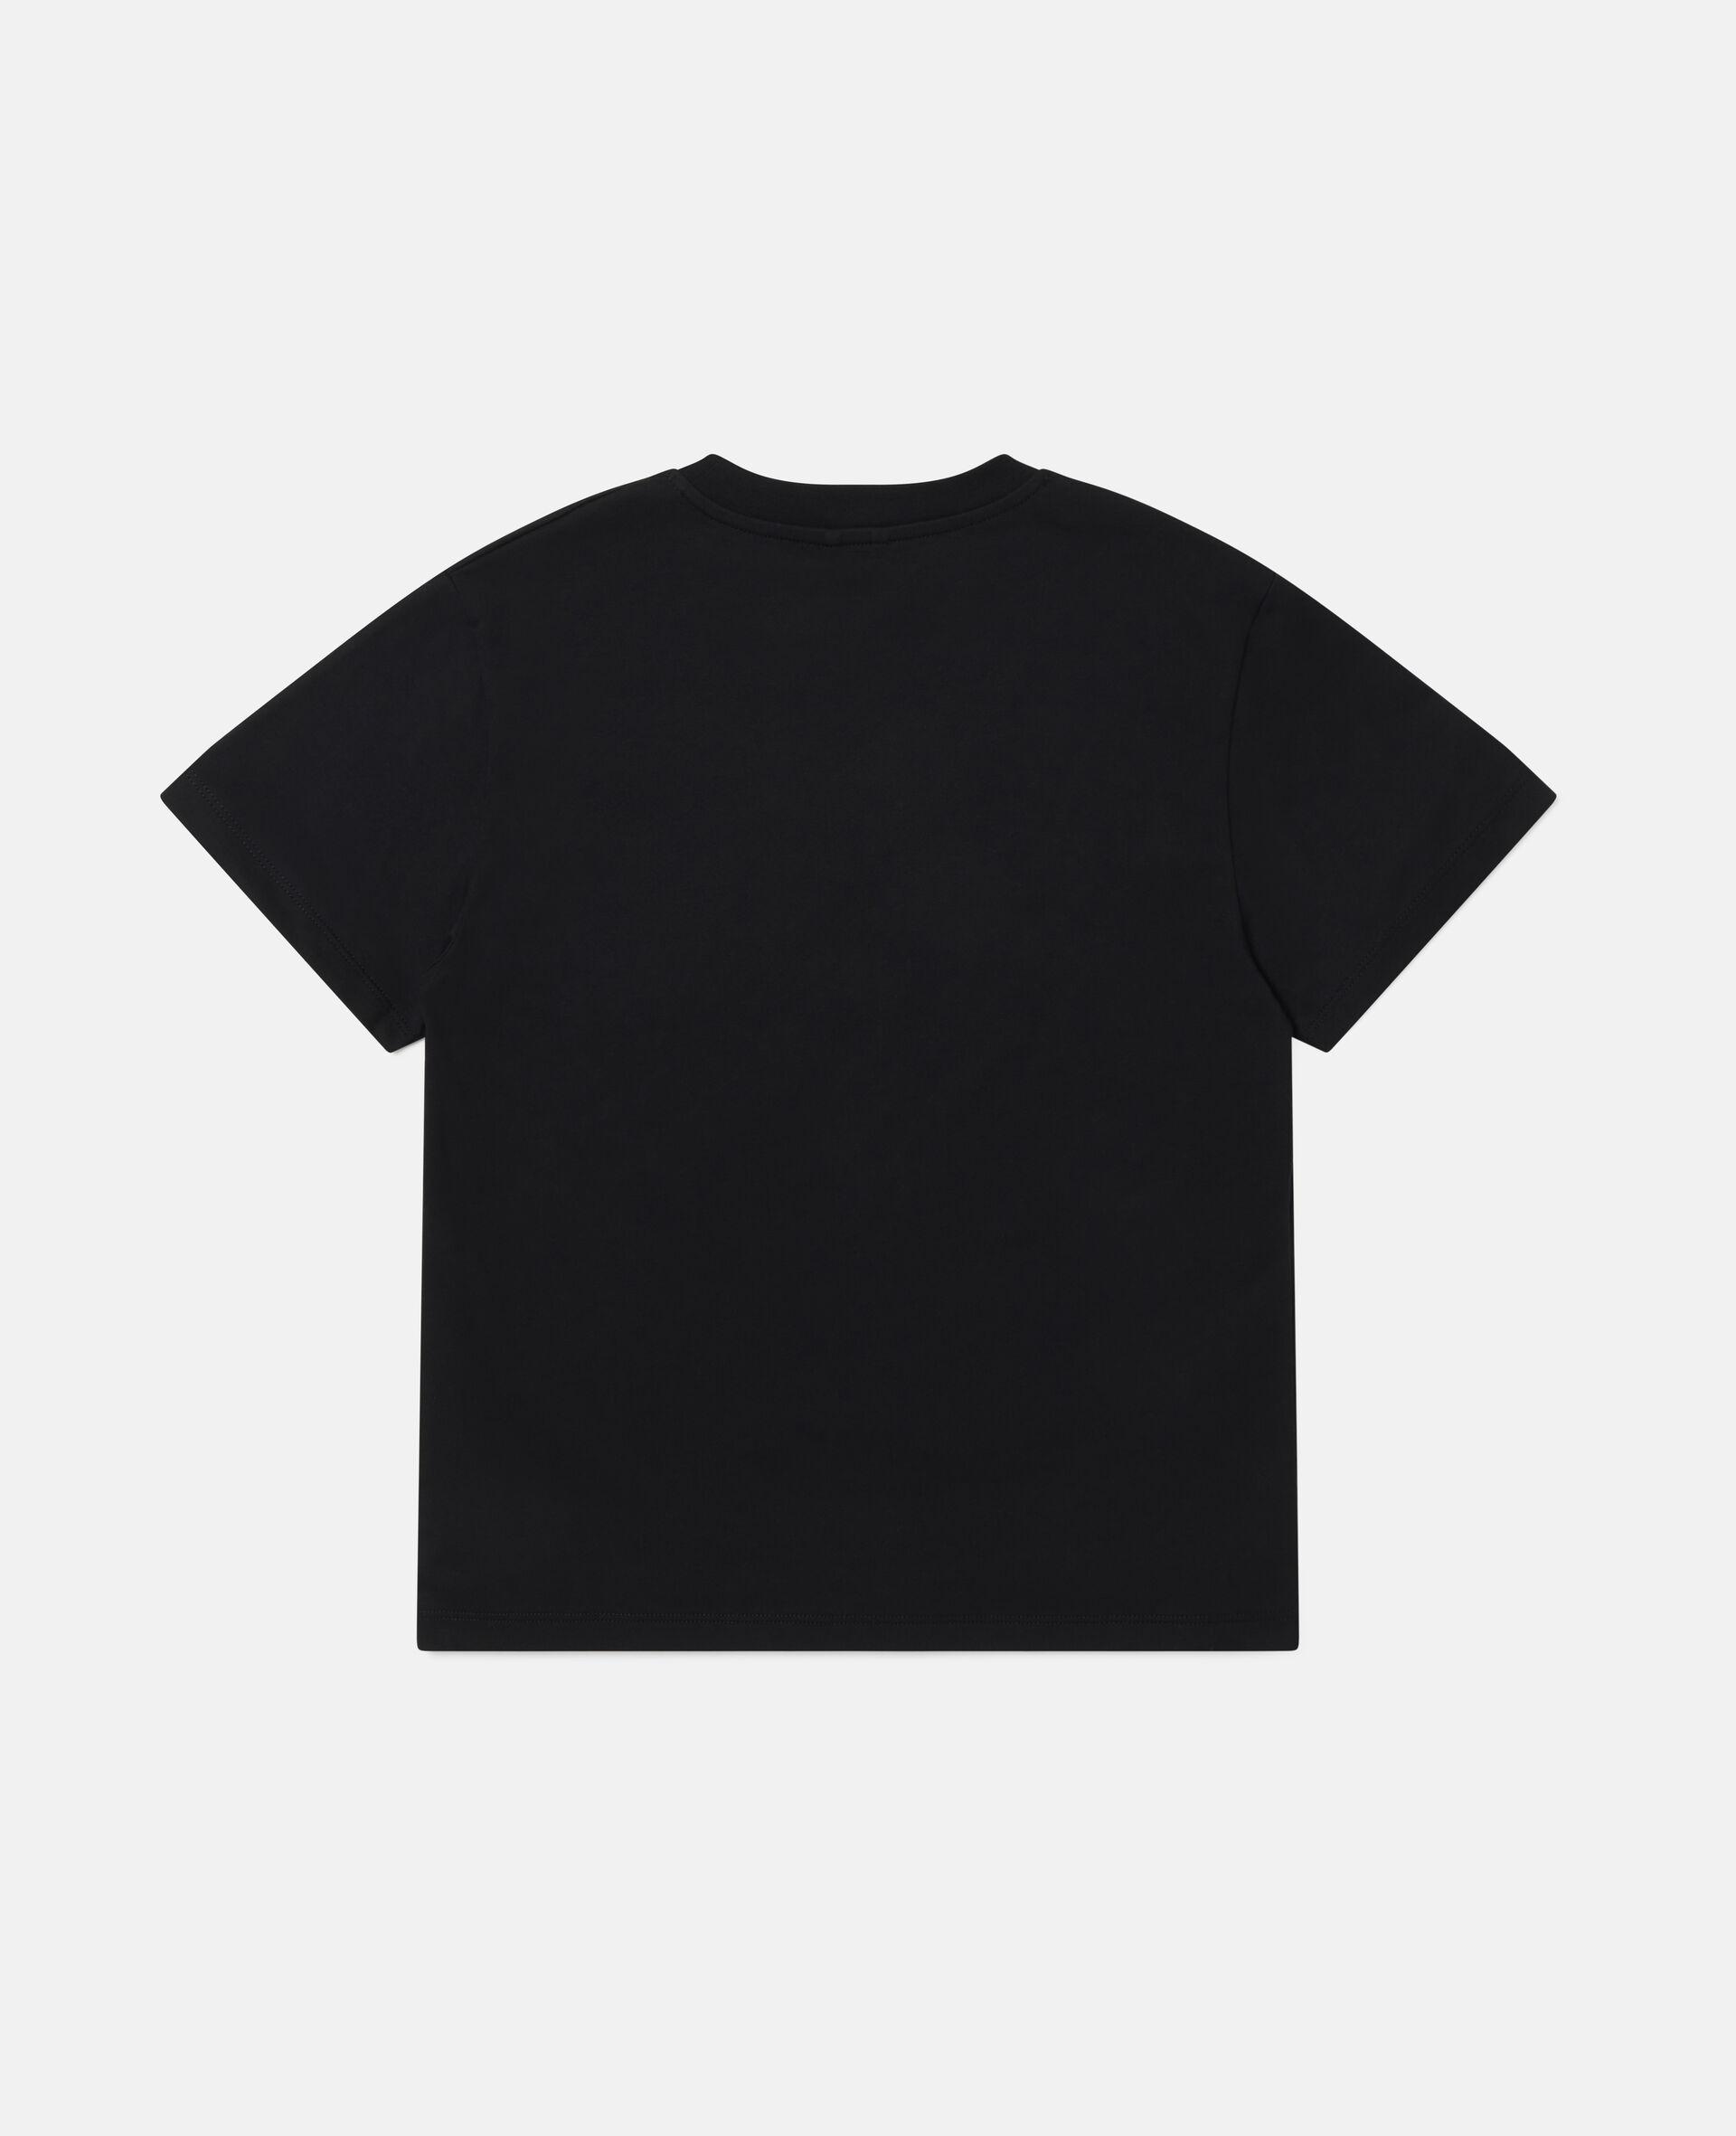 骷髅头印花超大号徽标棉质T恤-黑色-large image number 3